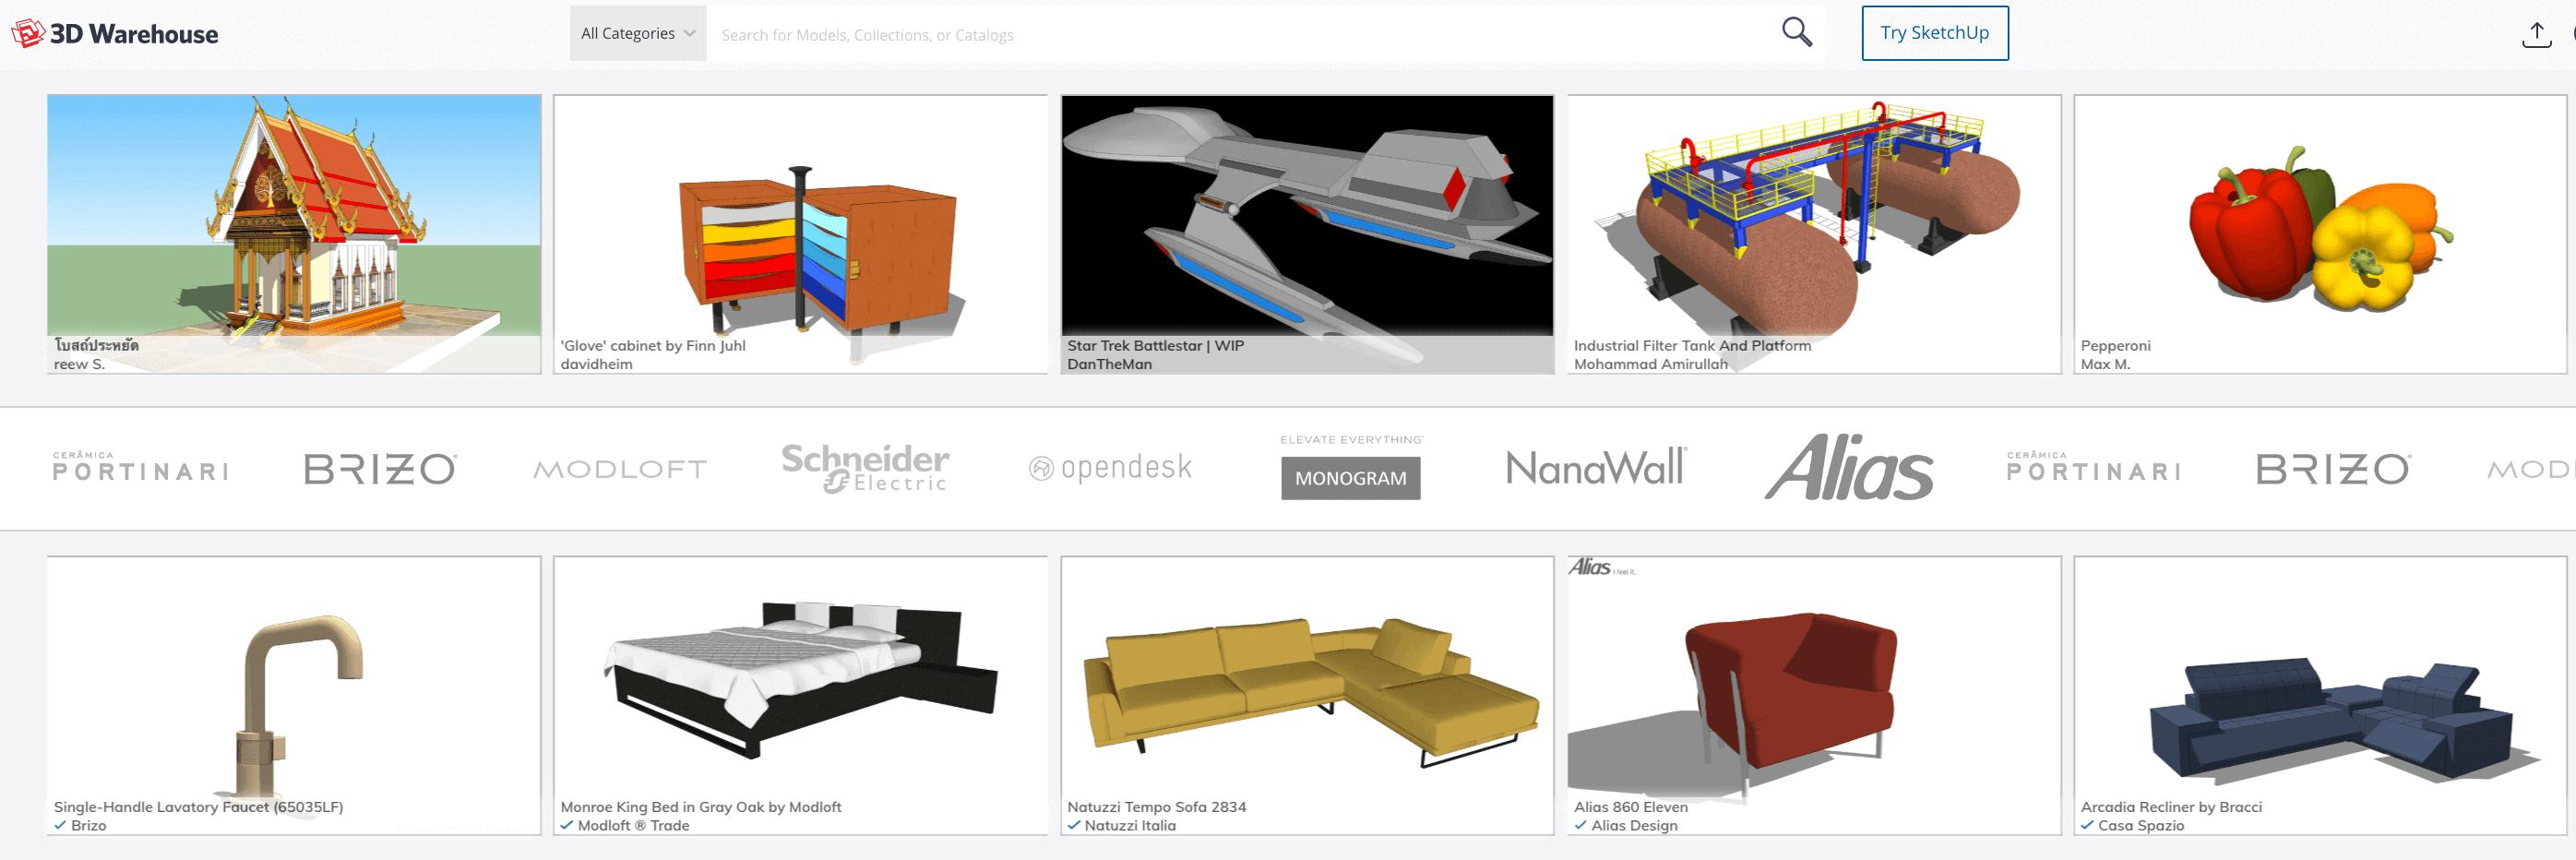 3D WareHouse Sketchup 3D